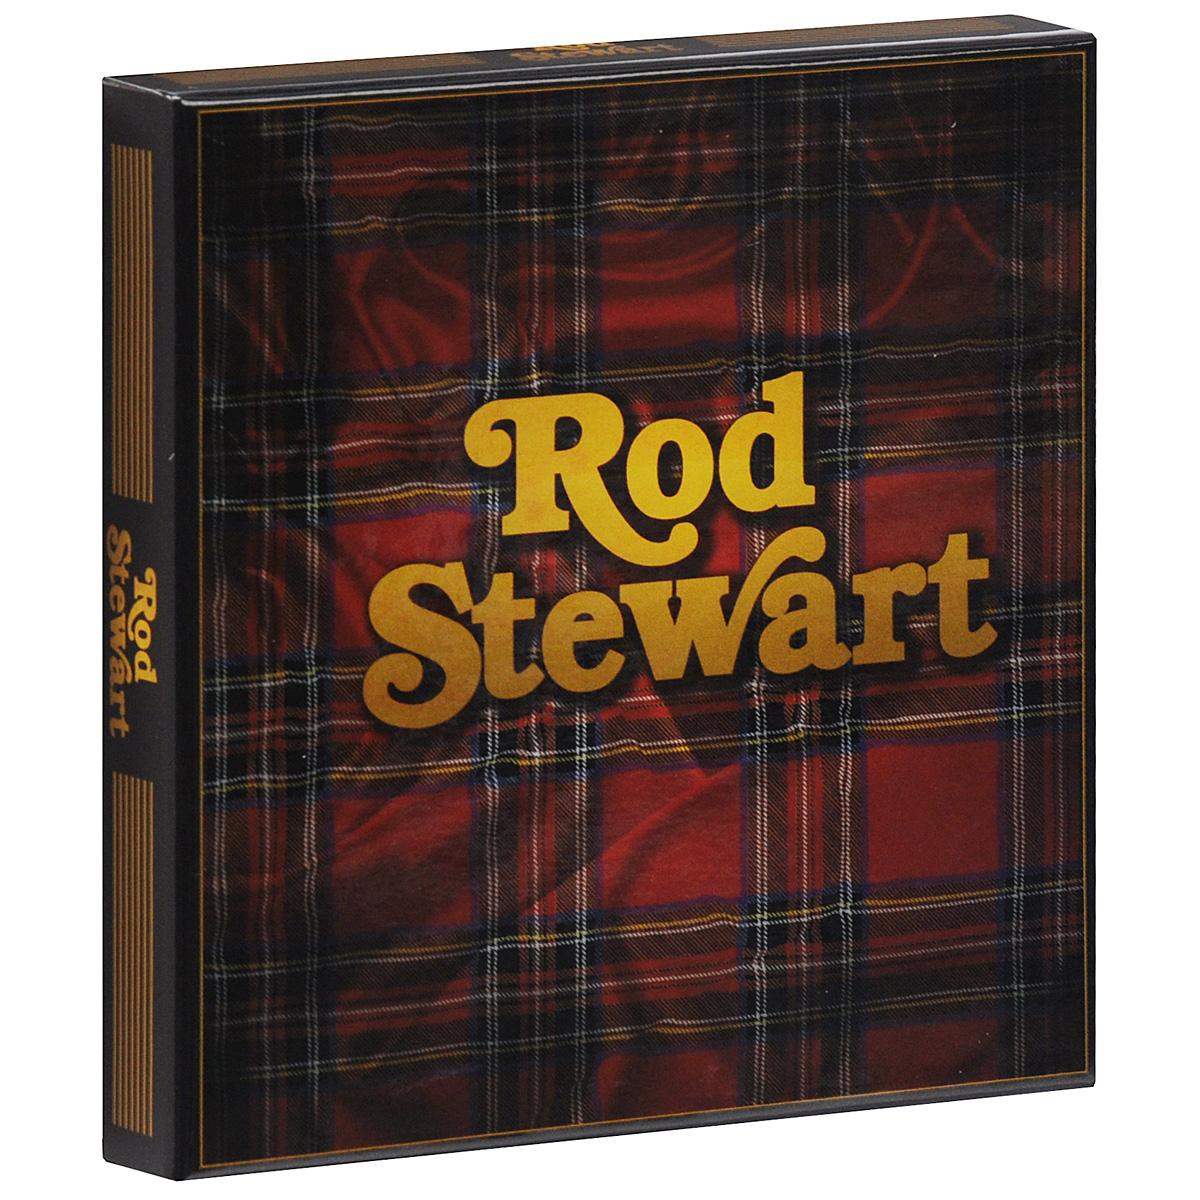 Род Стюарт Rod Stewart. Rod Stewart (5 CD) cd диск rod stewart it had to be you the great american songbook 1 cd